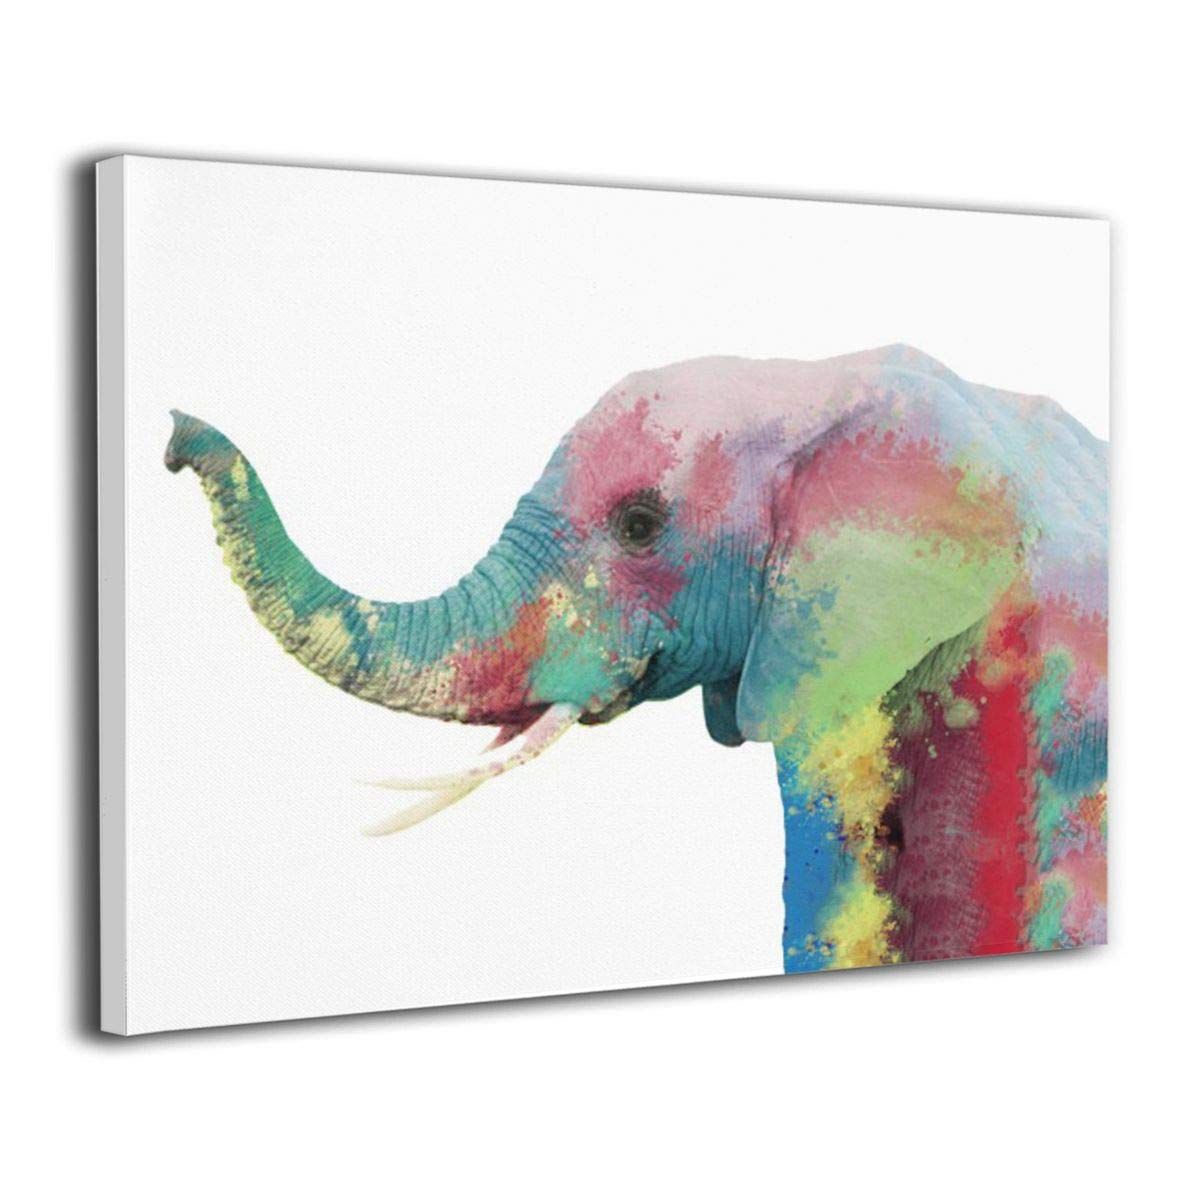 Art-logo Watercolor Elephant African Animal Wildlife Canvas Wall Art Modern Home Decor Poster Prints 16''x20''